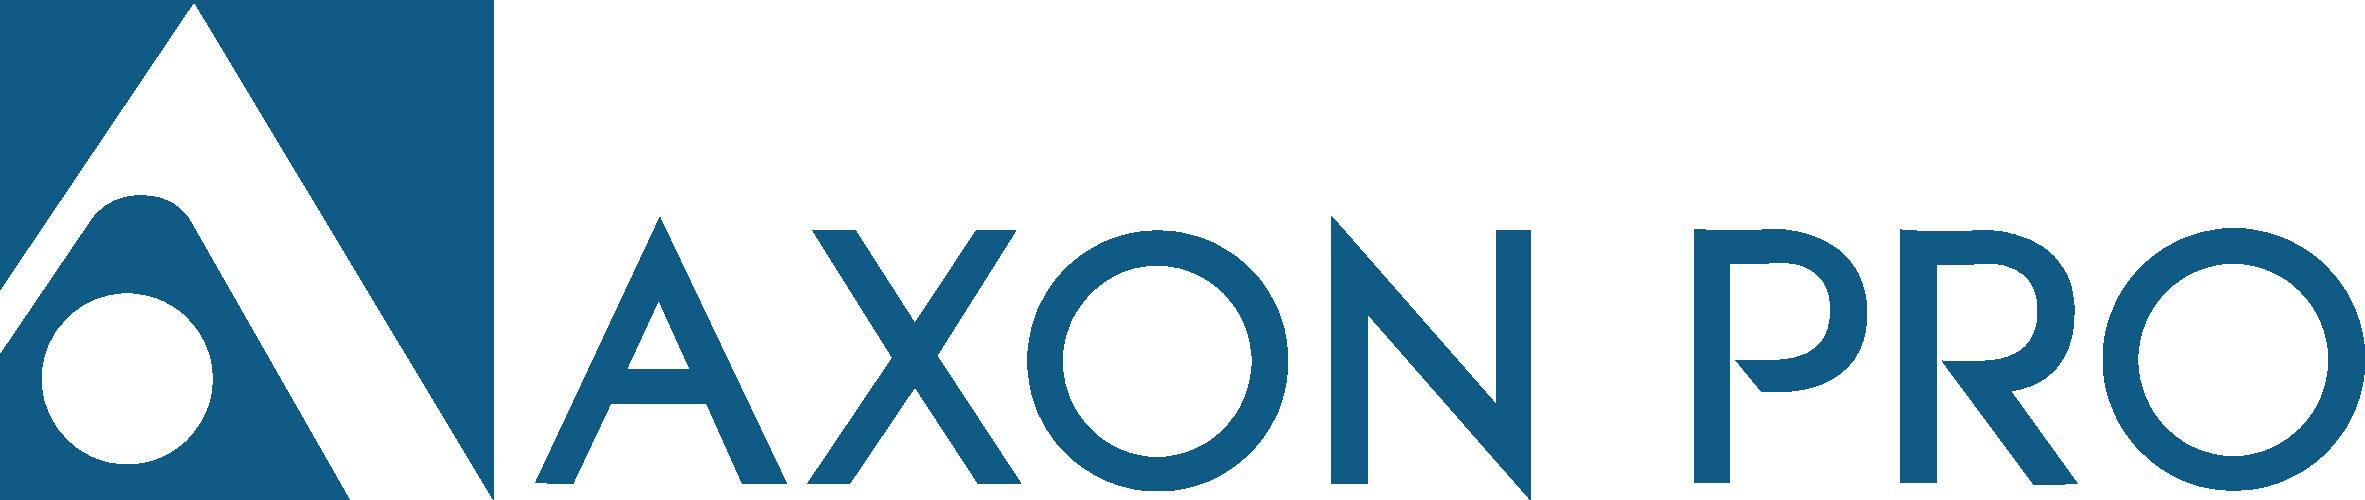 axonpro logo OK